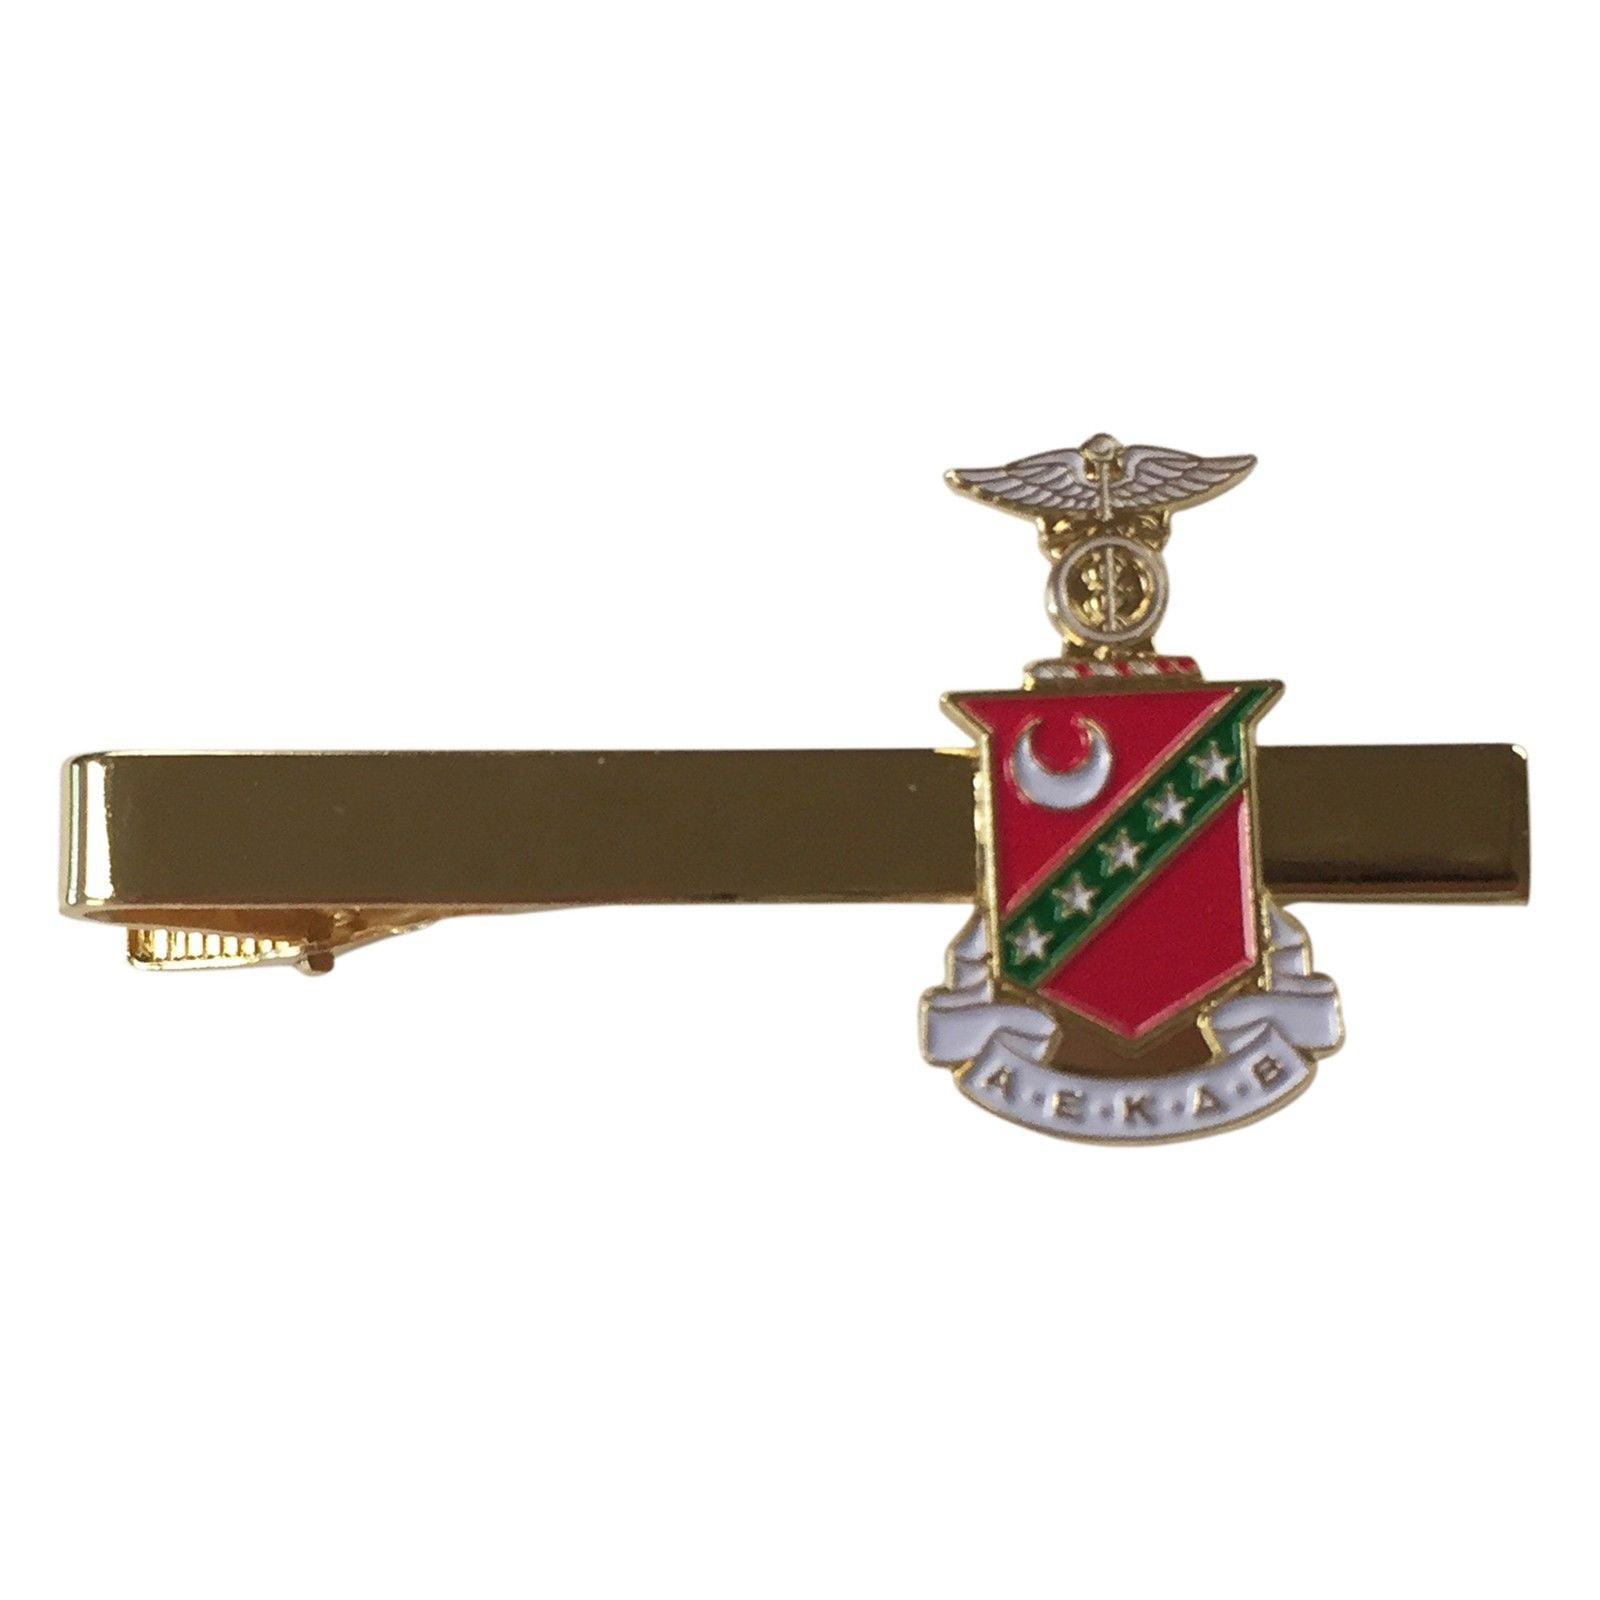 Kappa Sigma Gold Color Crest Tie Bar/Clip - Brand New